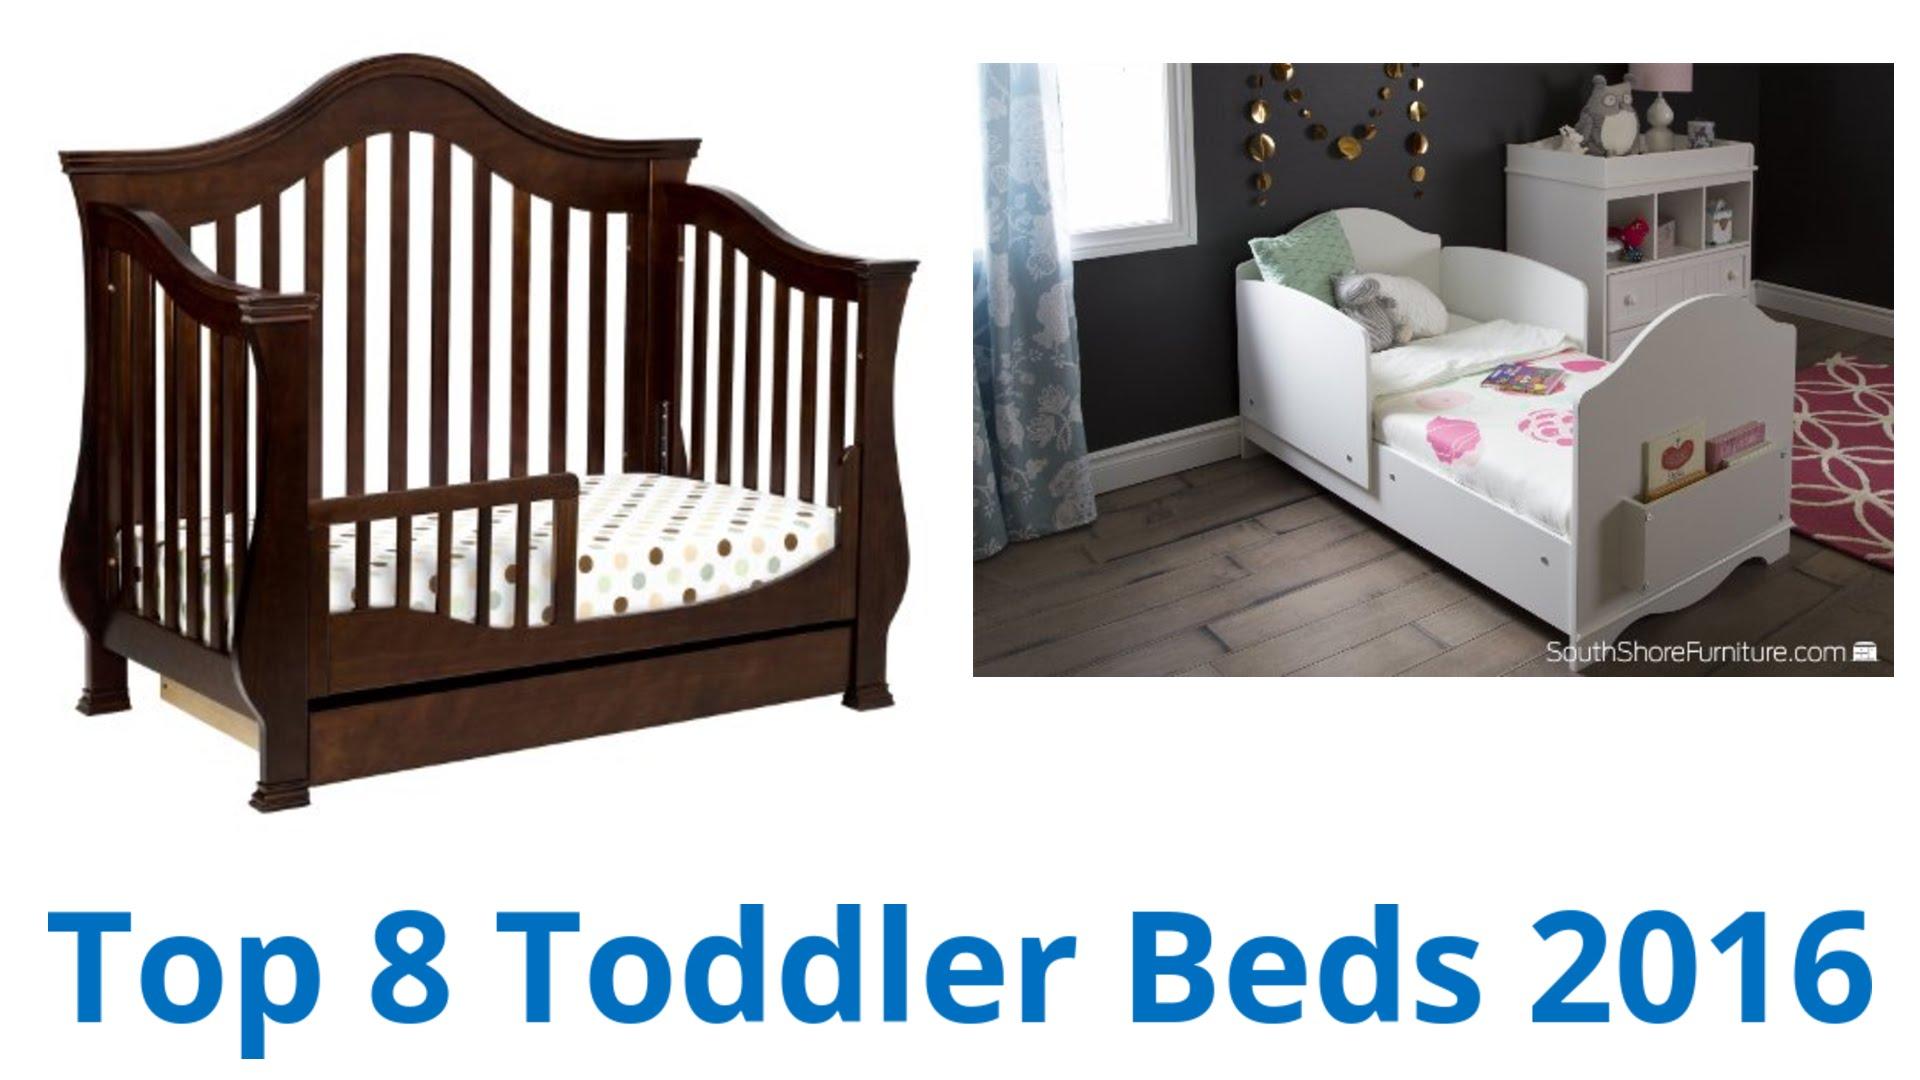 Best Toddler Beds 2016